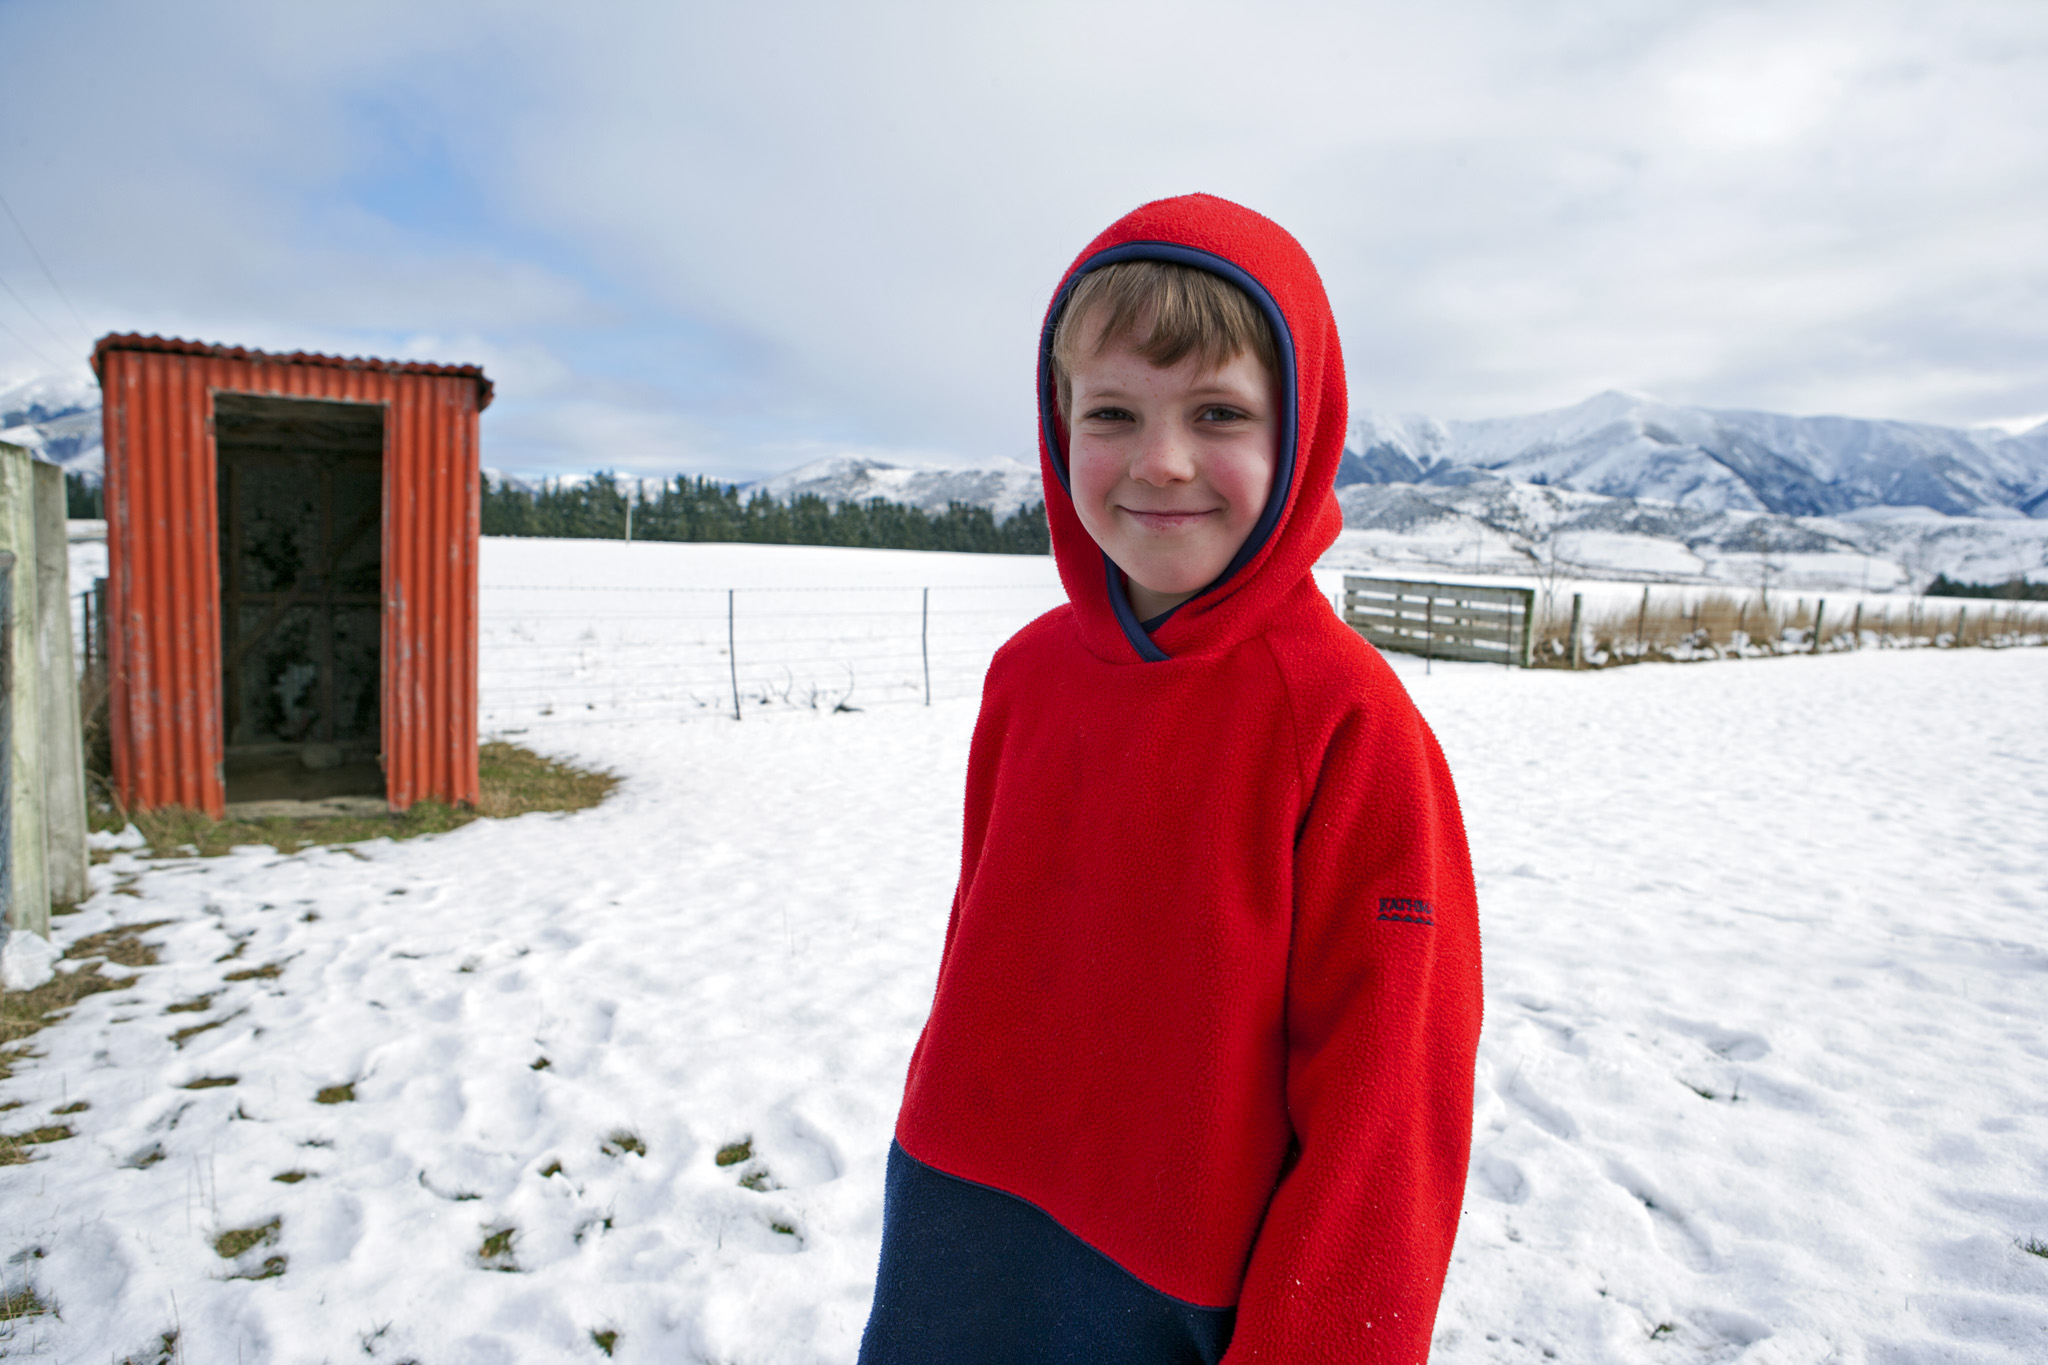 Samuel-in-snow.jpg